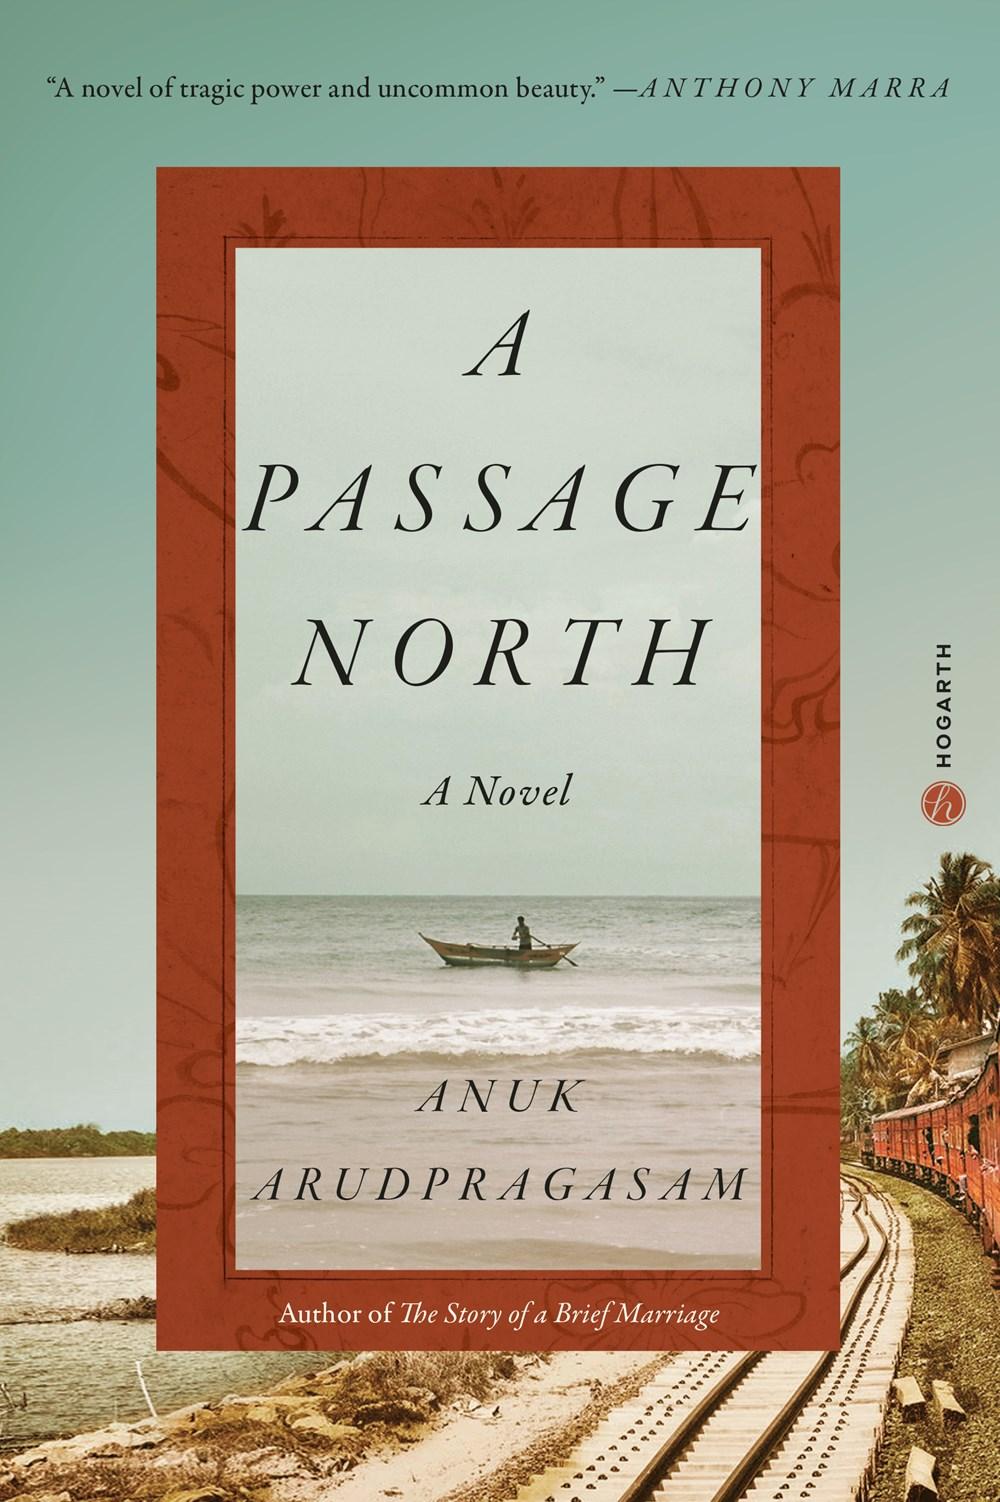 A Passage North by Anuk Arudpragasam